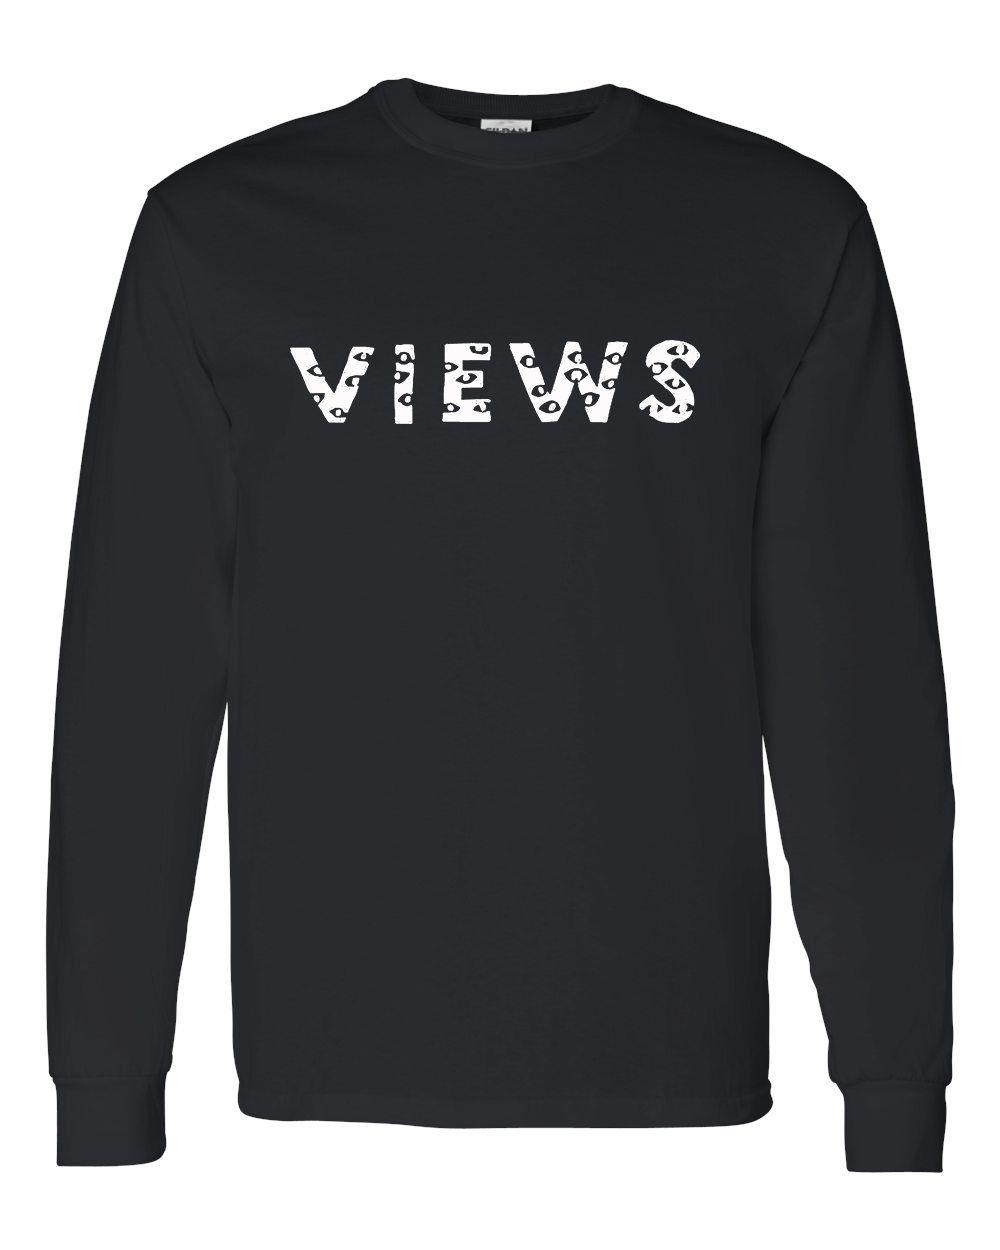 0a5a6c233eb5 Drake Summer Sixteen Tour Official Views Logo Tee Ovo Long Sleeve Shirt  Eyes by ArtsByBlanco on Etsy